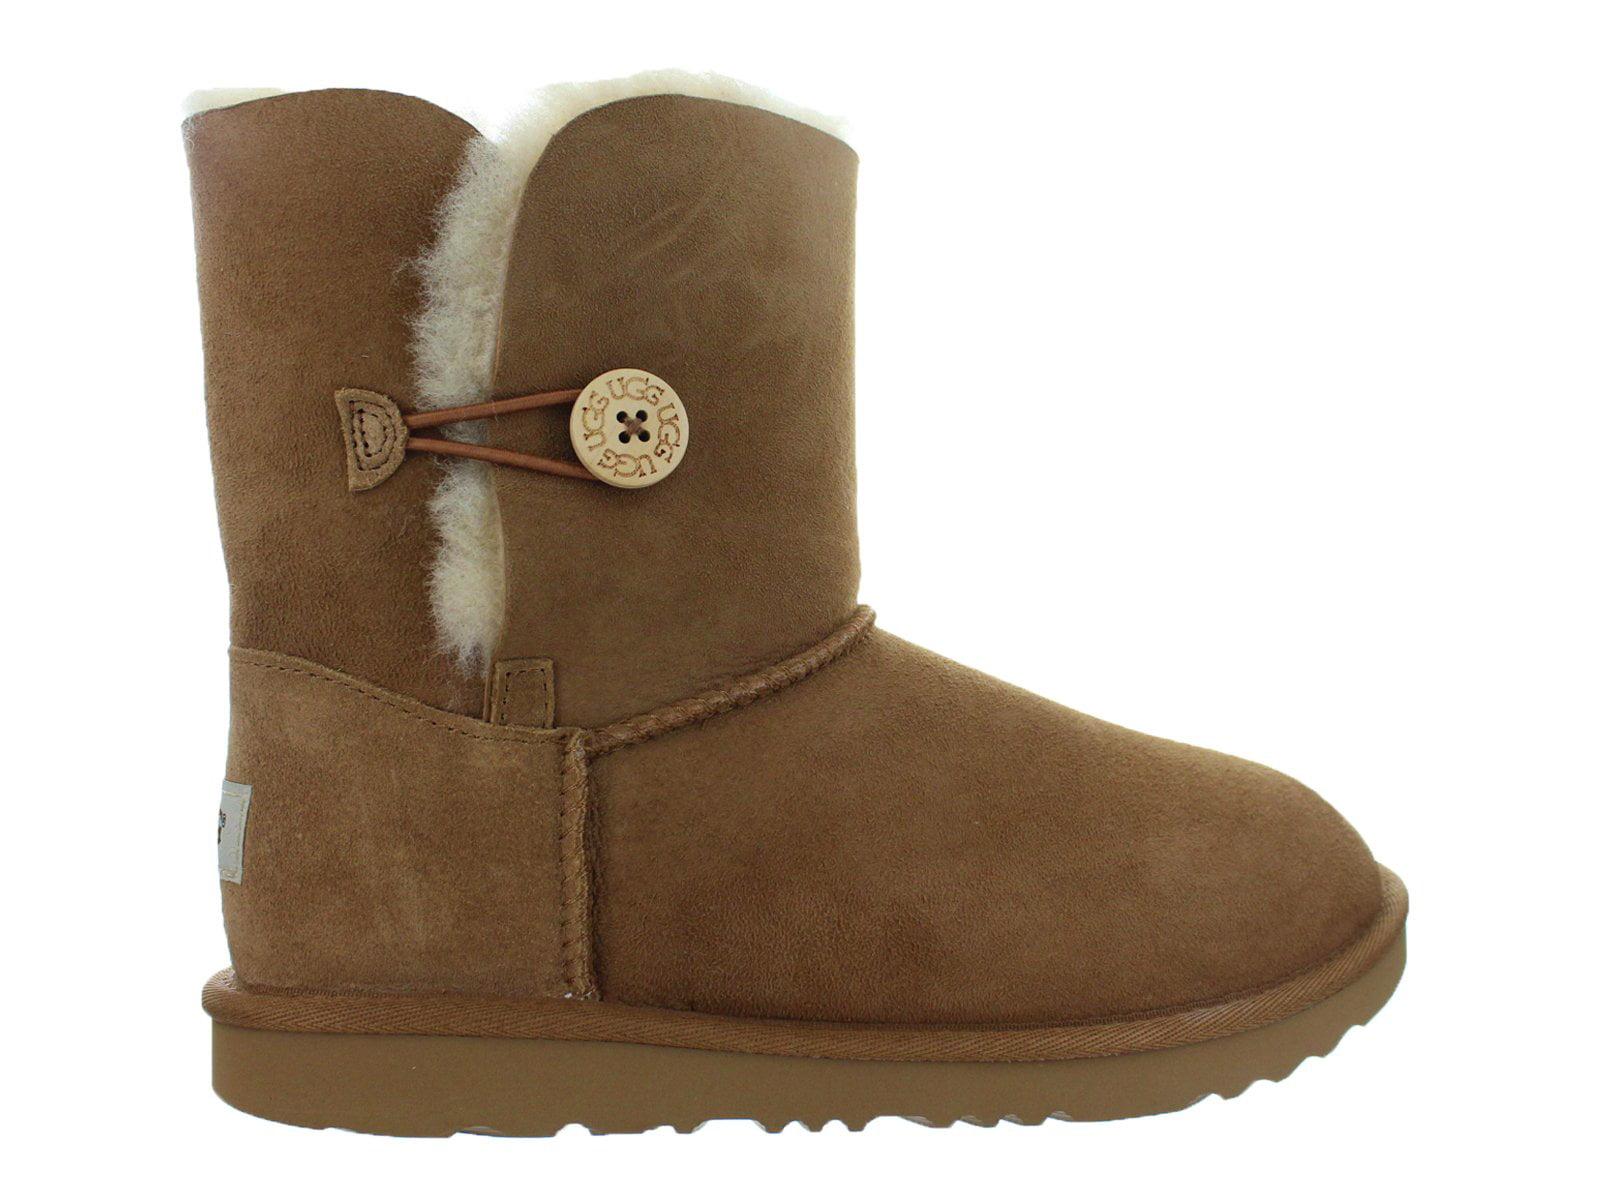 b34614e09f3 Kids UGG Bailey Button II Boot Chestnut Brown 1017400K-CHE